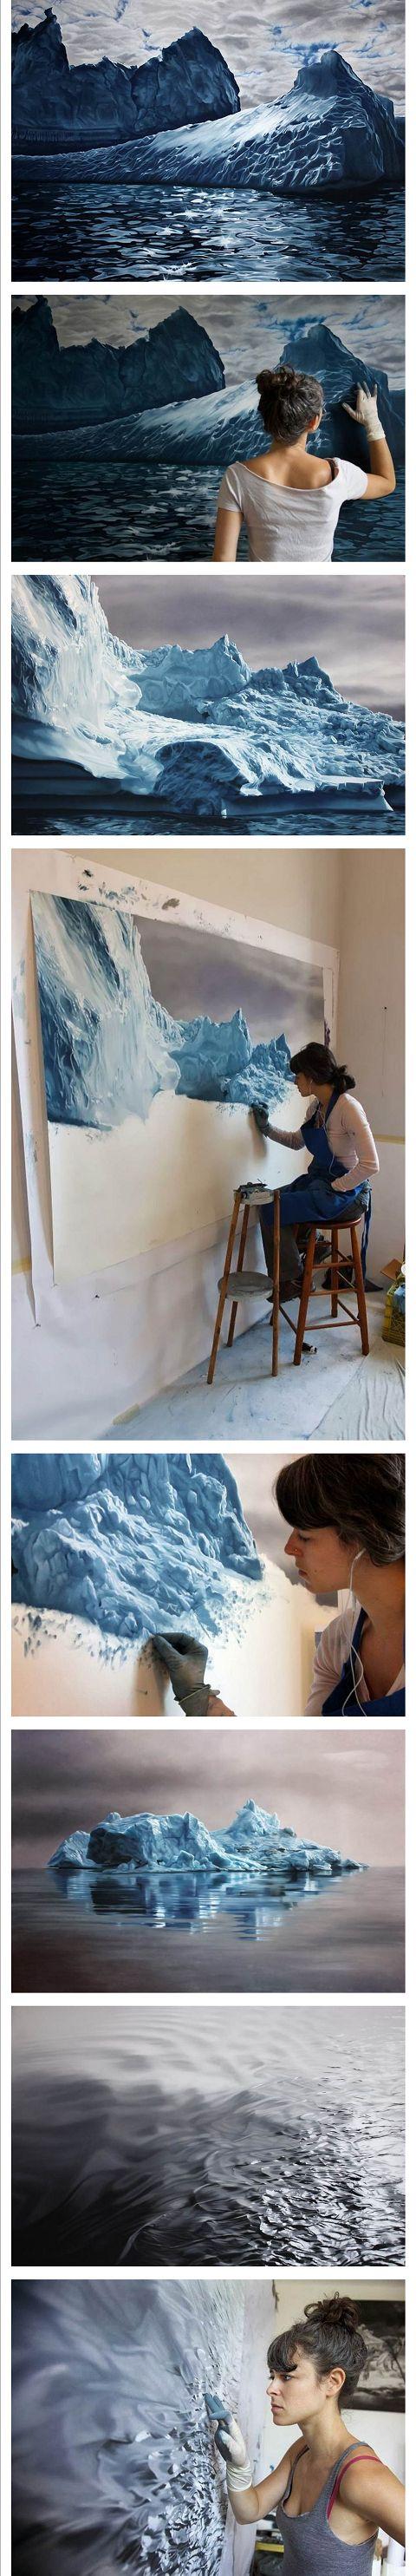 Unbelivable Zaria Forman Artworks